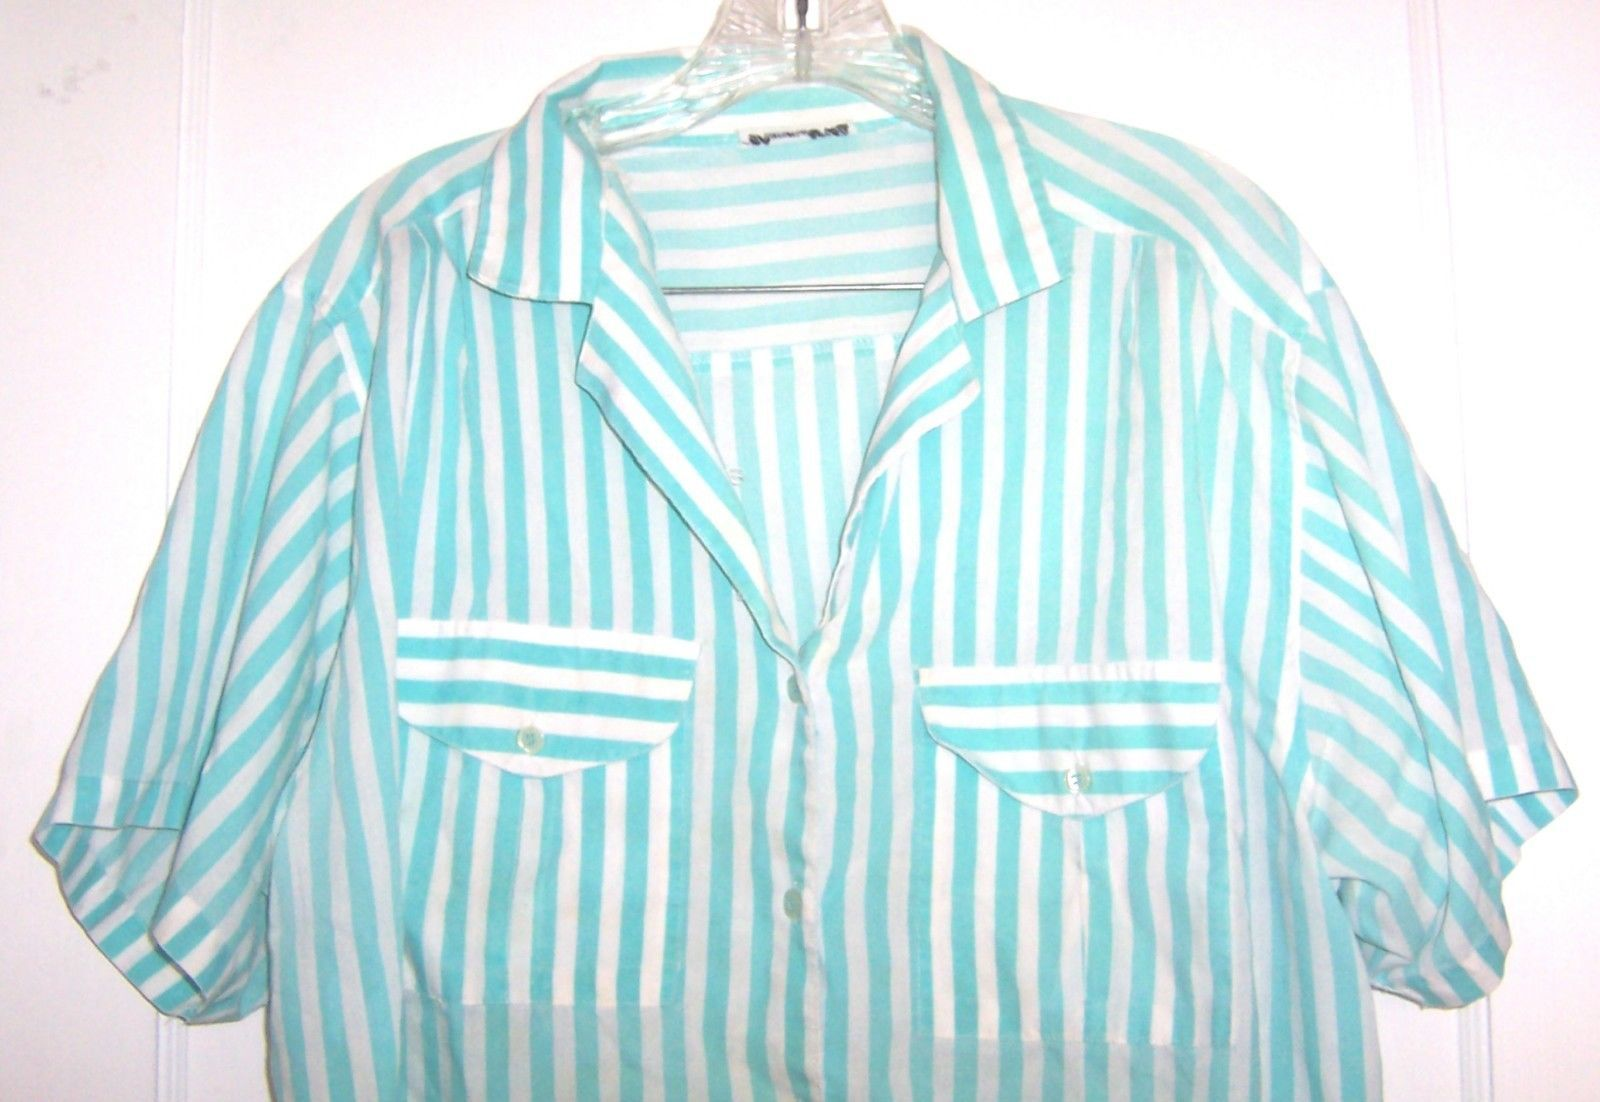 Plus Size 16W - Diamond Hill Aqua Green & White Striped Short Sleeve Blouse